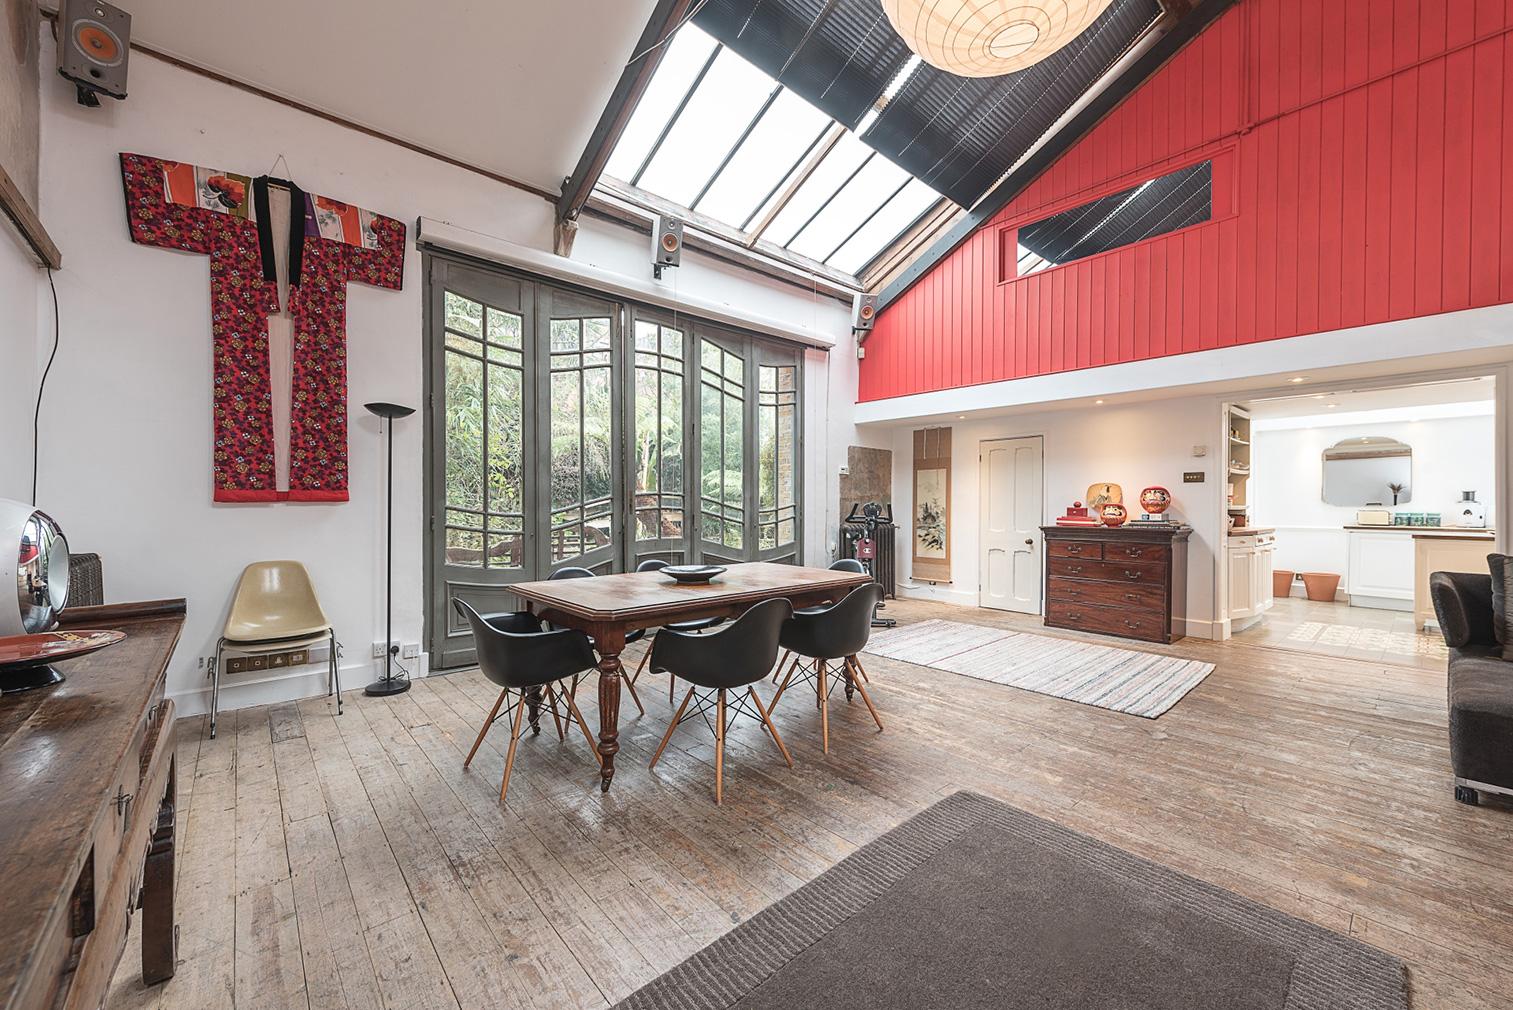 Former artist's studio for sale in London